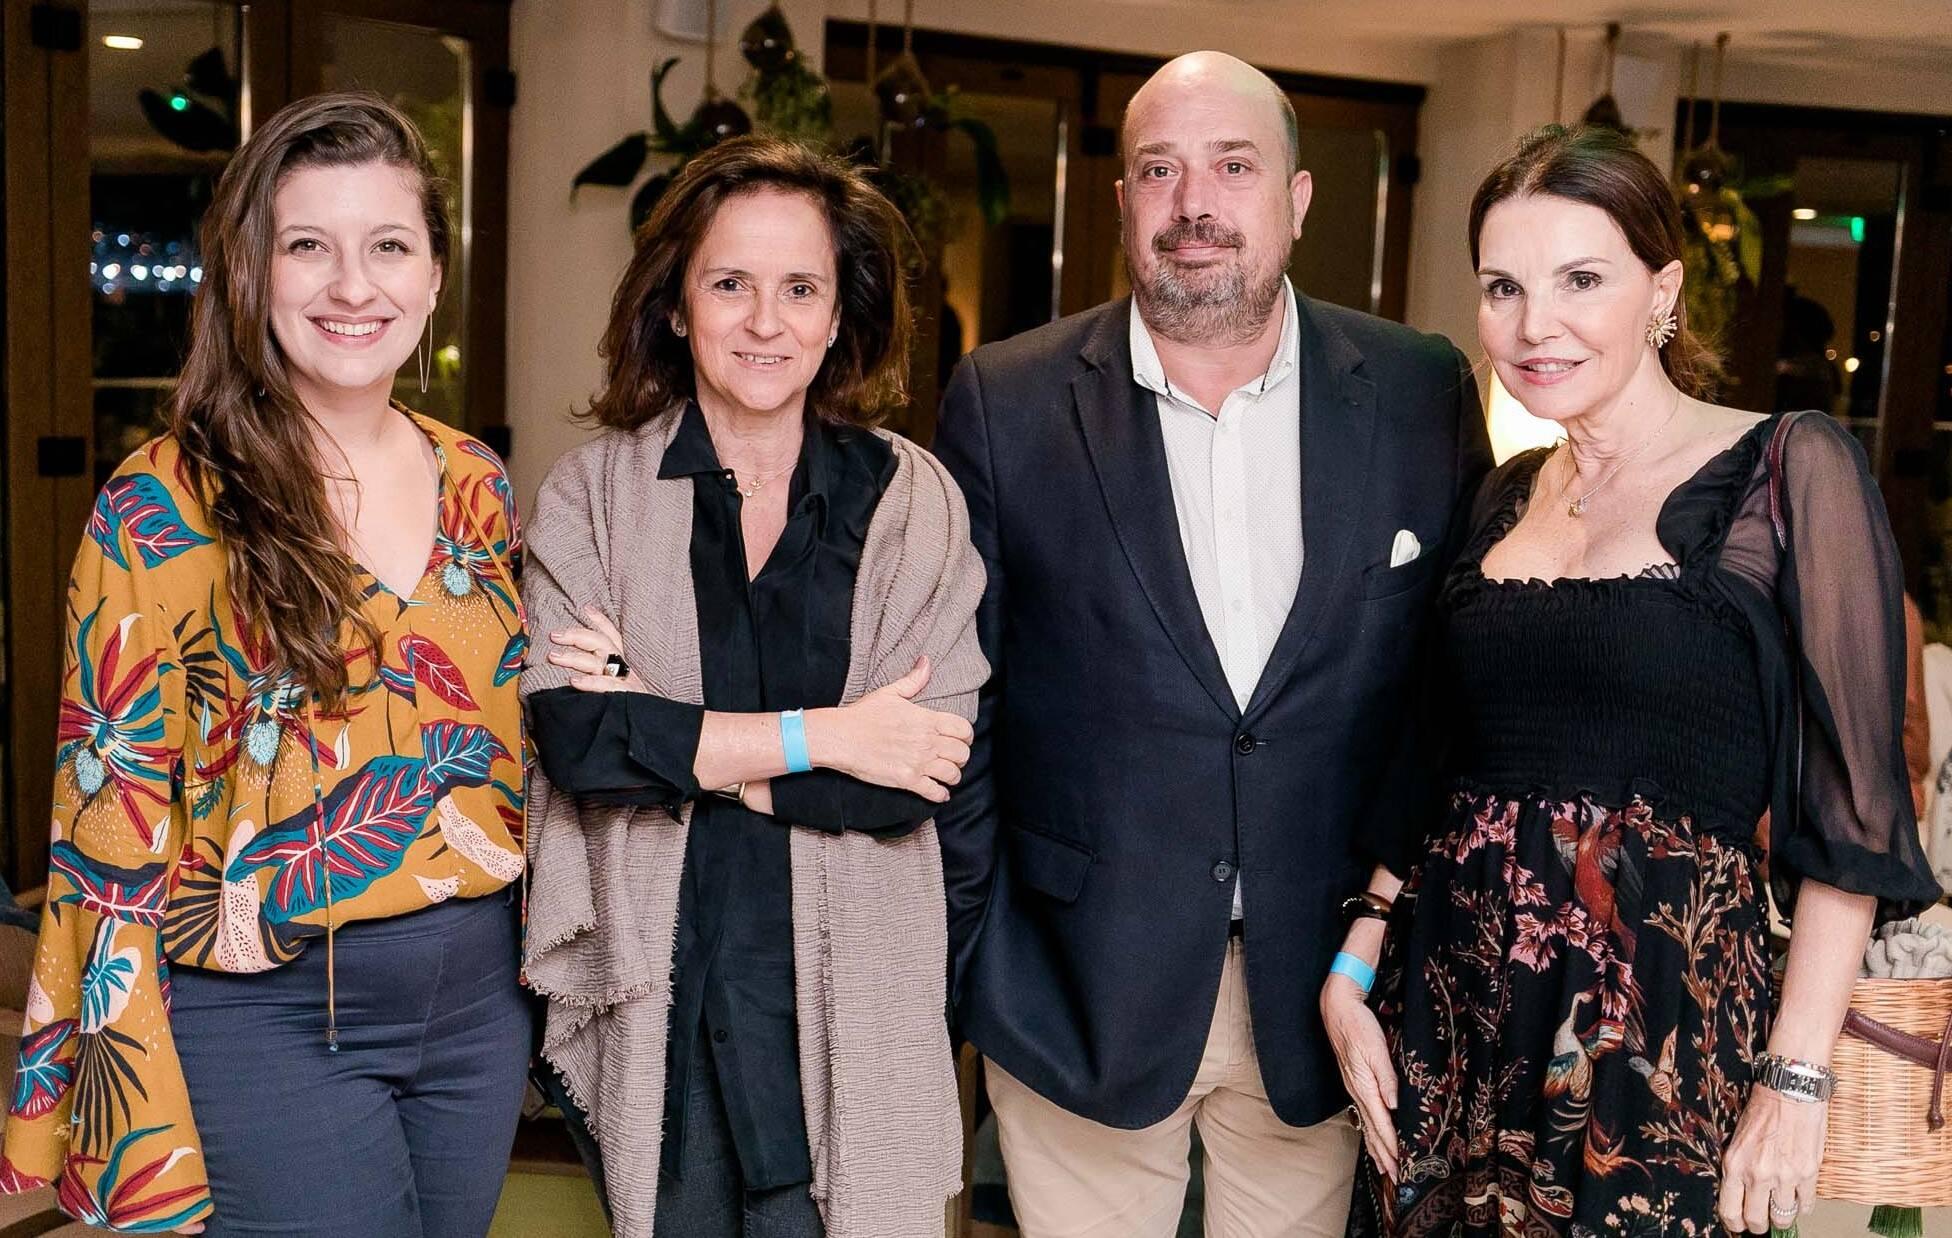 Camila Salgueiro, Patricia Quentel, Michael Nagy e Patricia Mayer /Foto: Miguel Sá